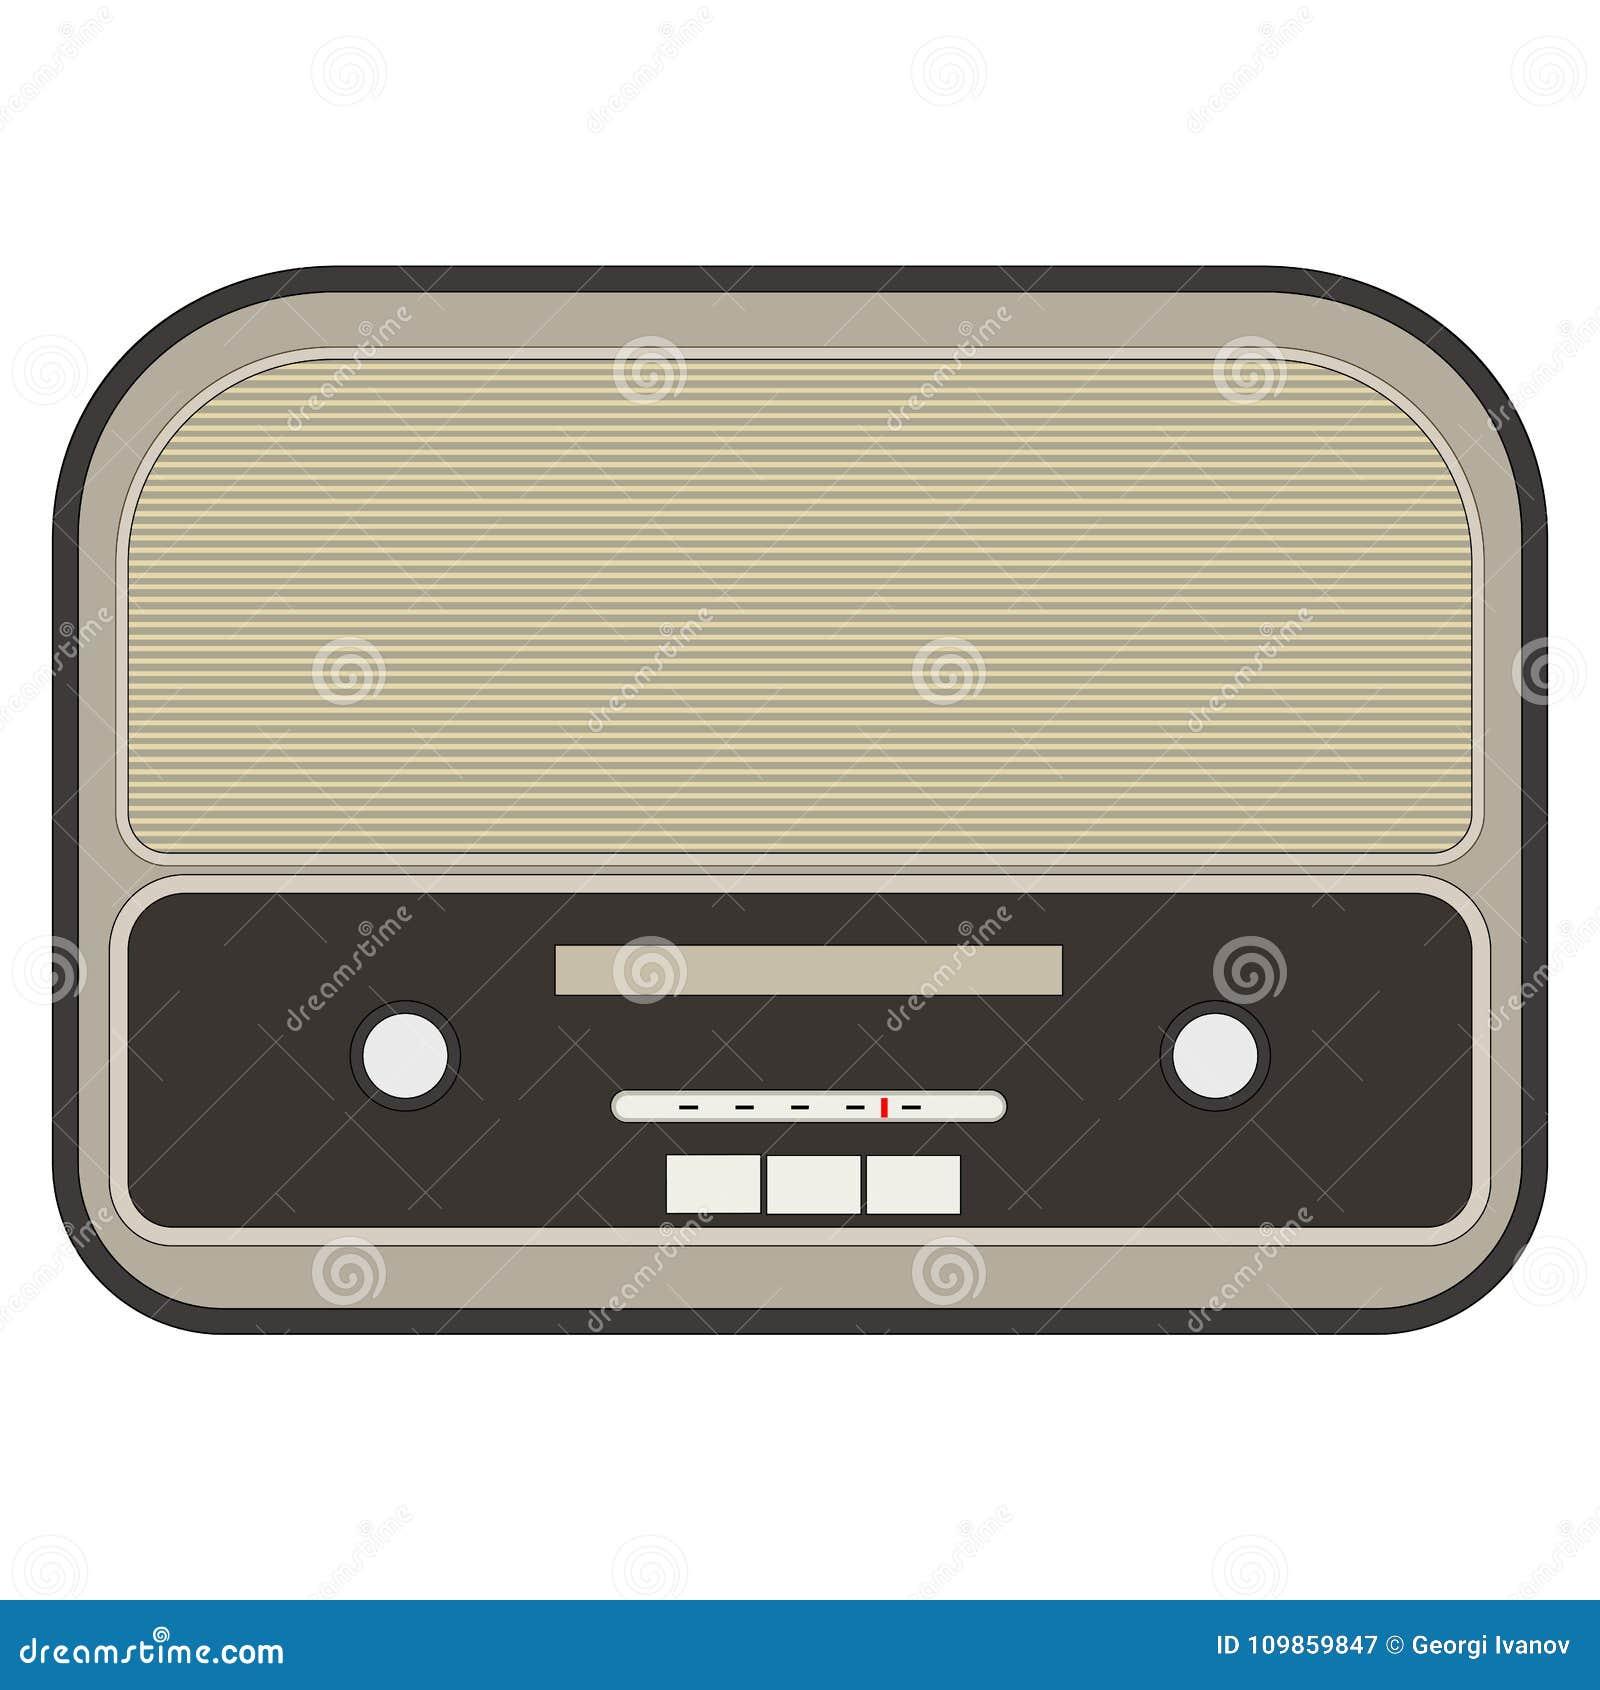 Flat, Vector Retro Radio Design/icon Stock Vector - Illustration of ...